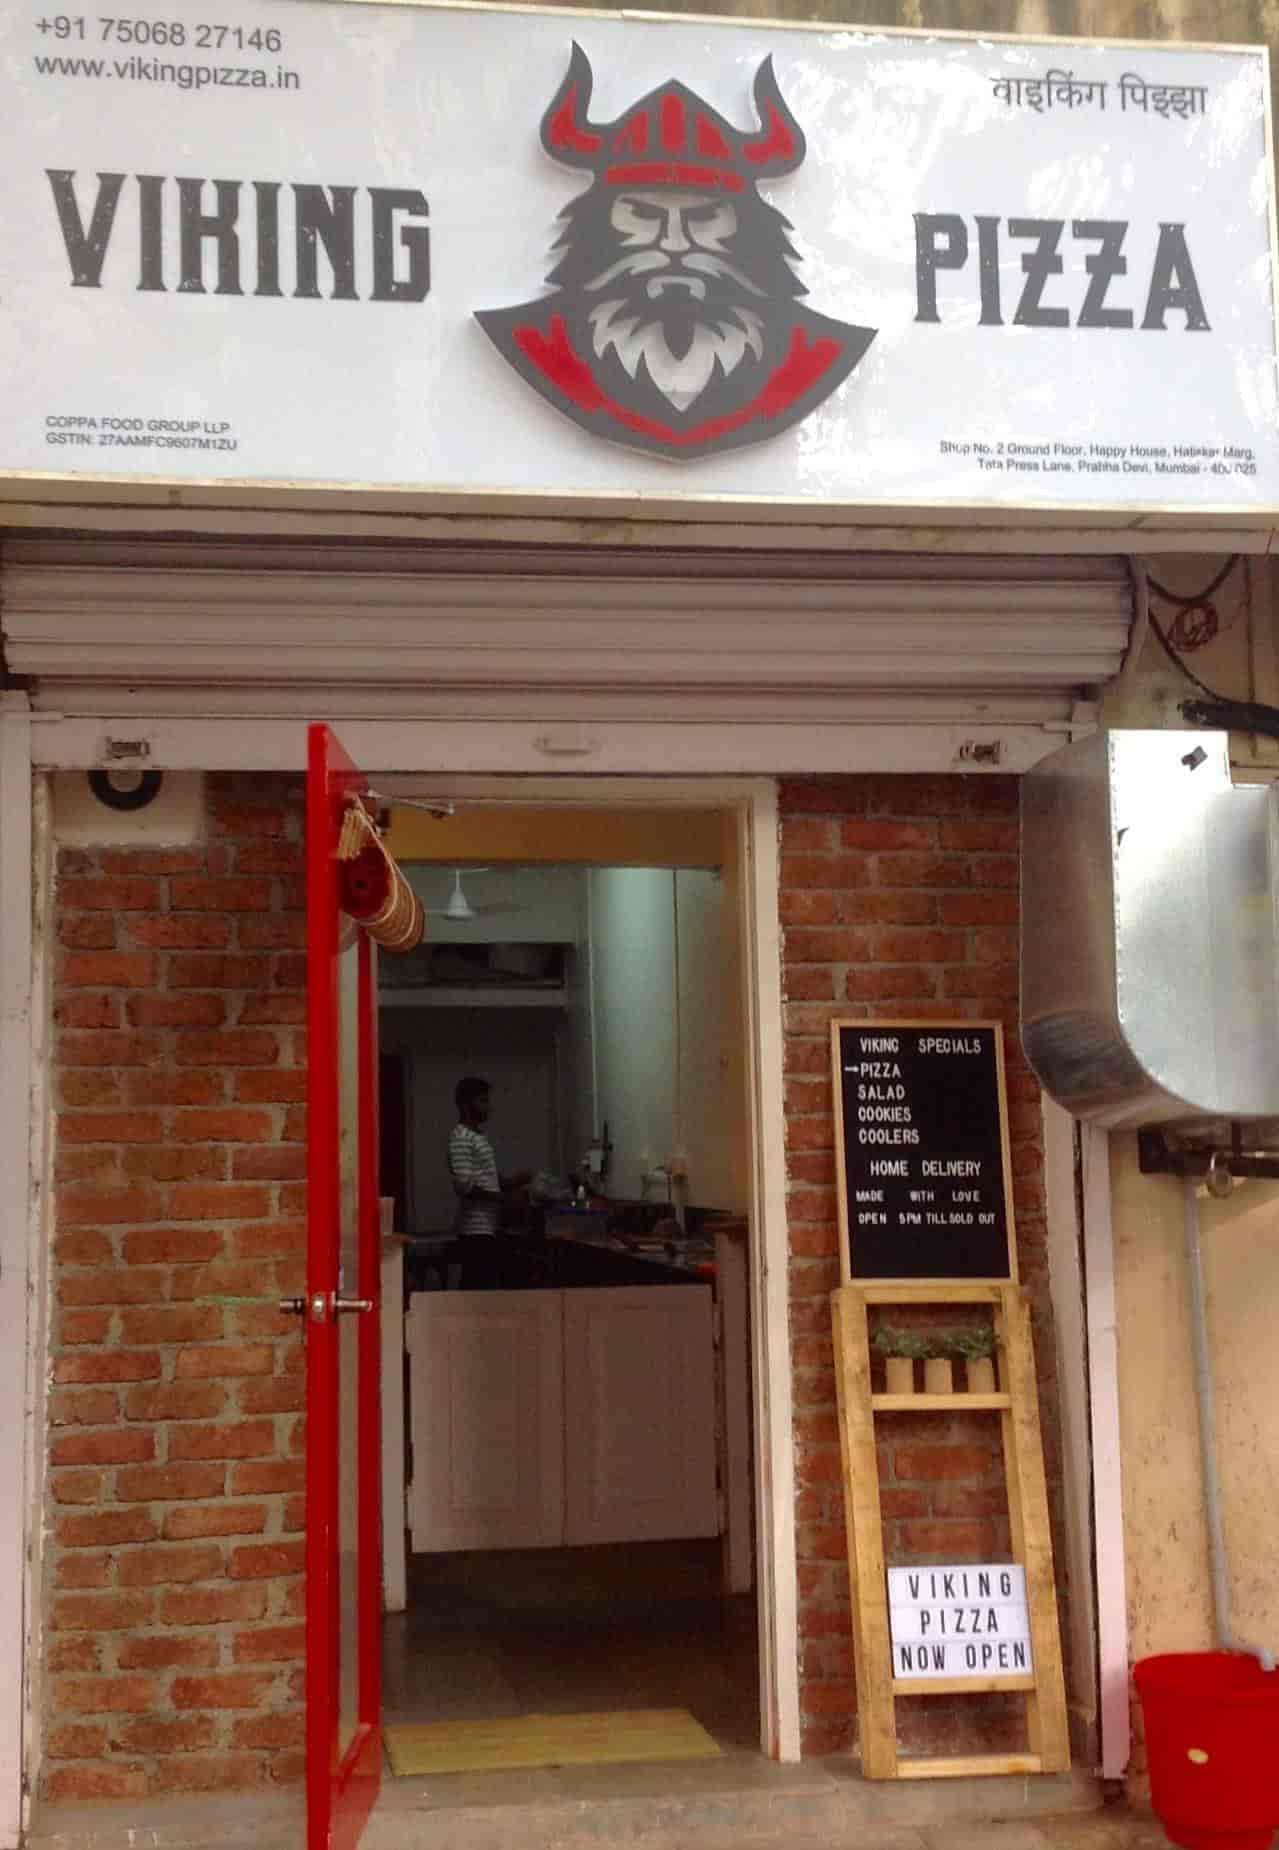 Viking Pizza, Prabhadevi, Mumbai - Pizza Outlets - Justdial